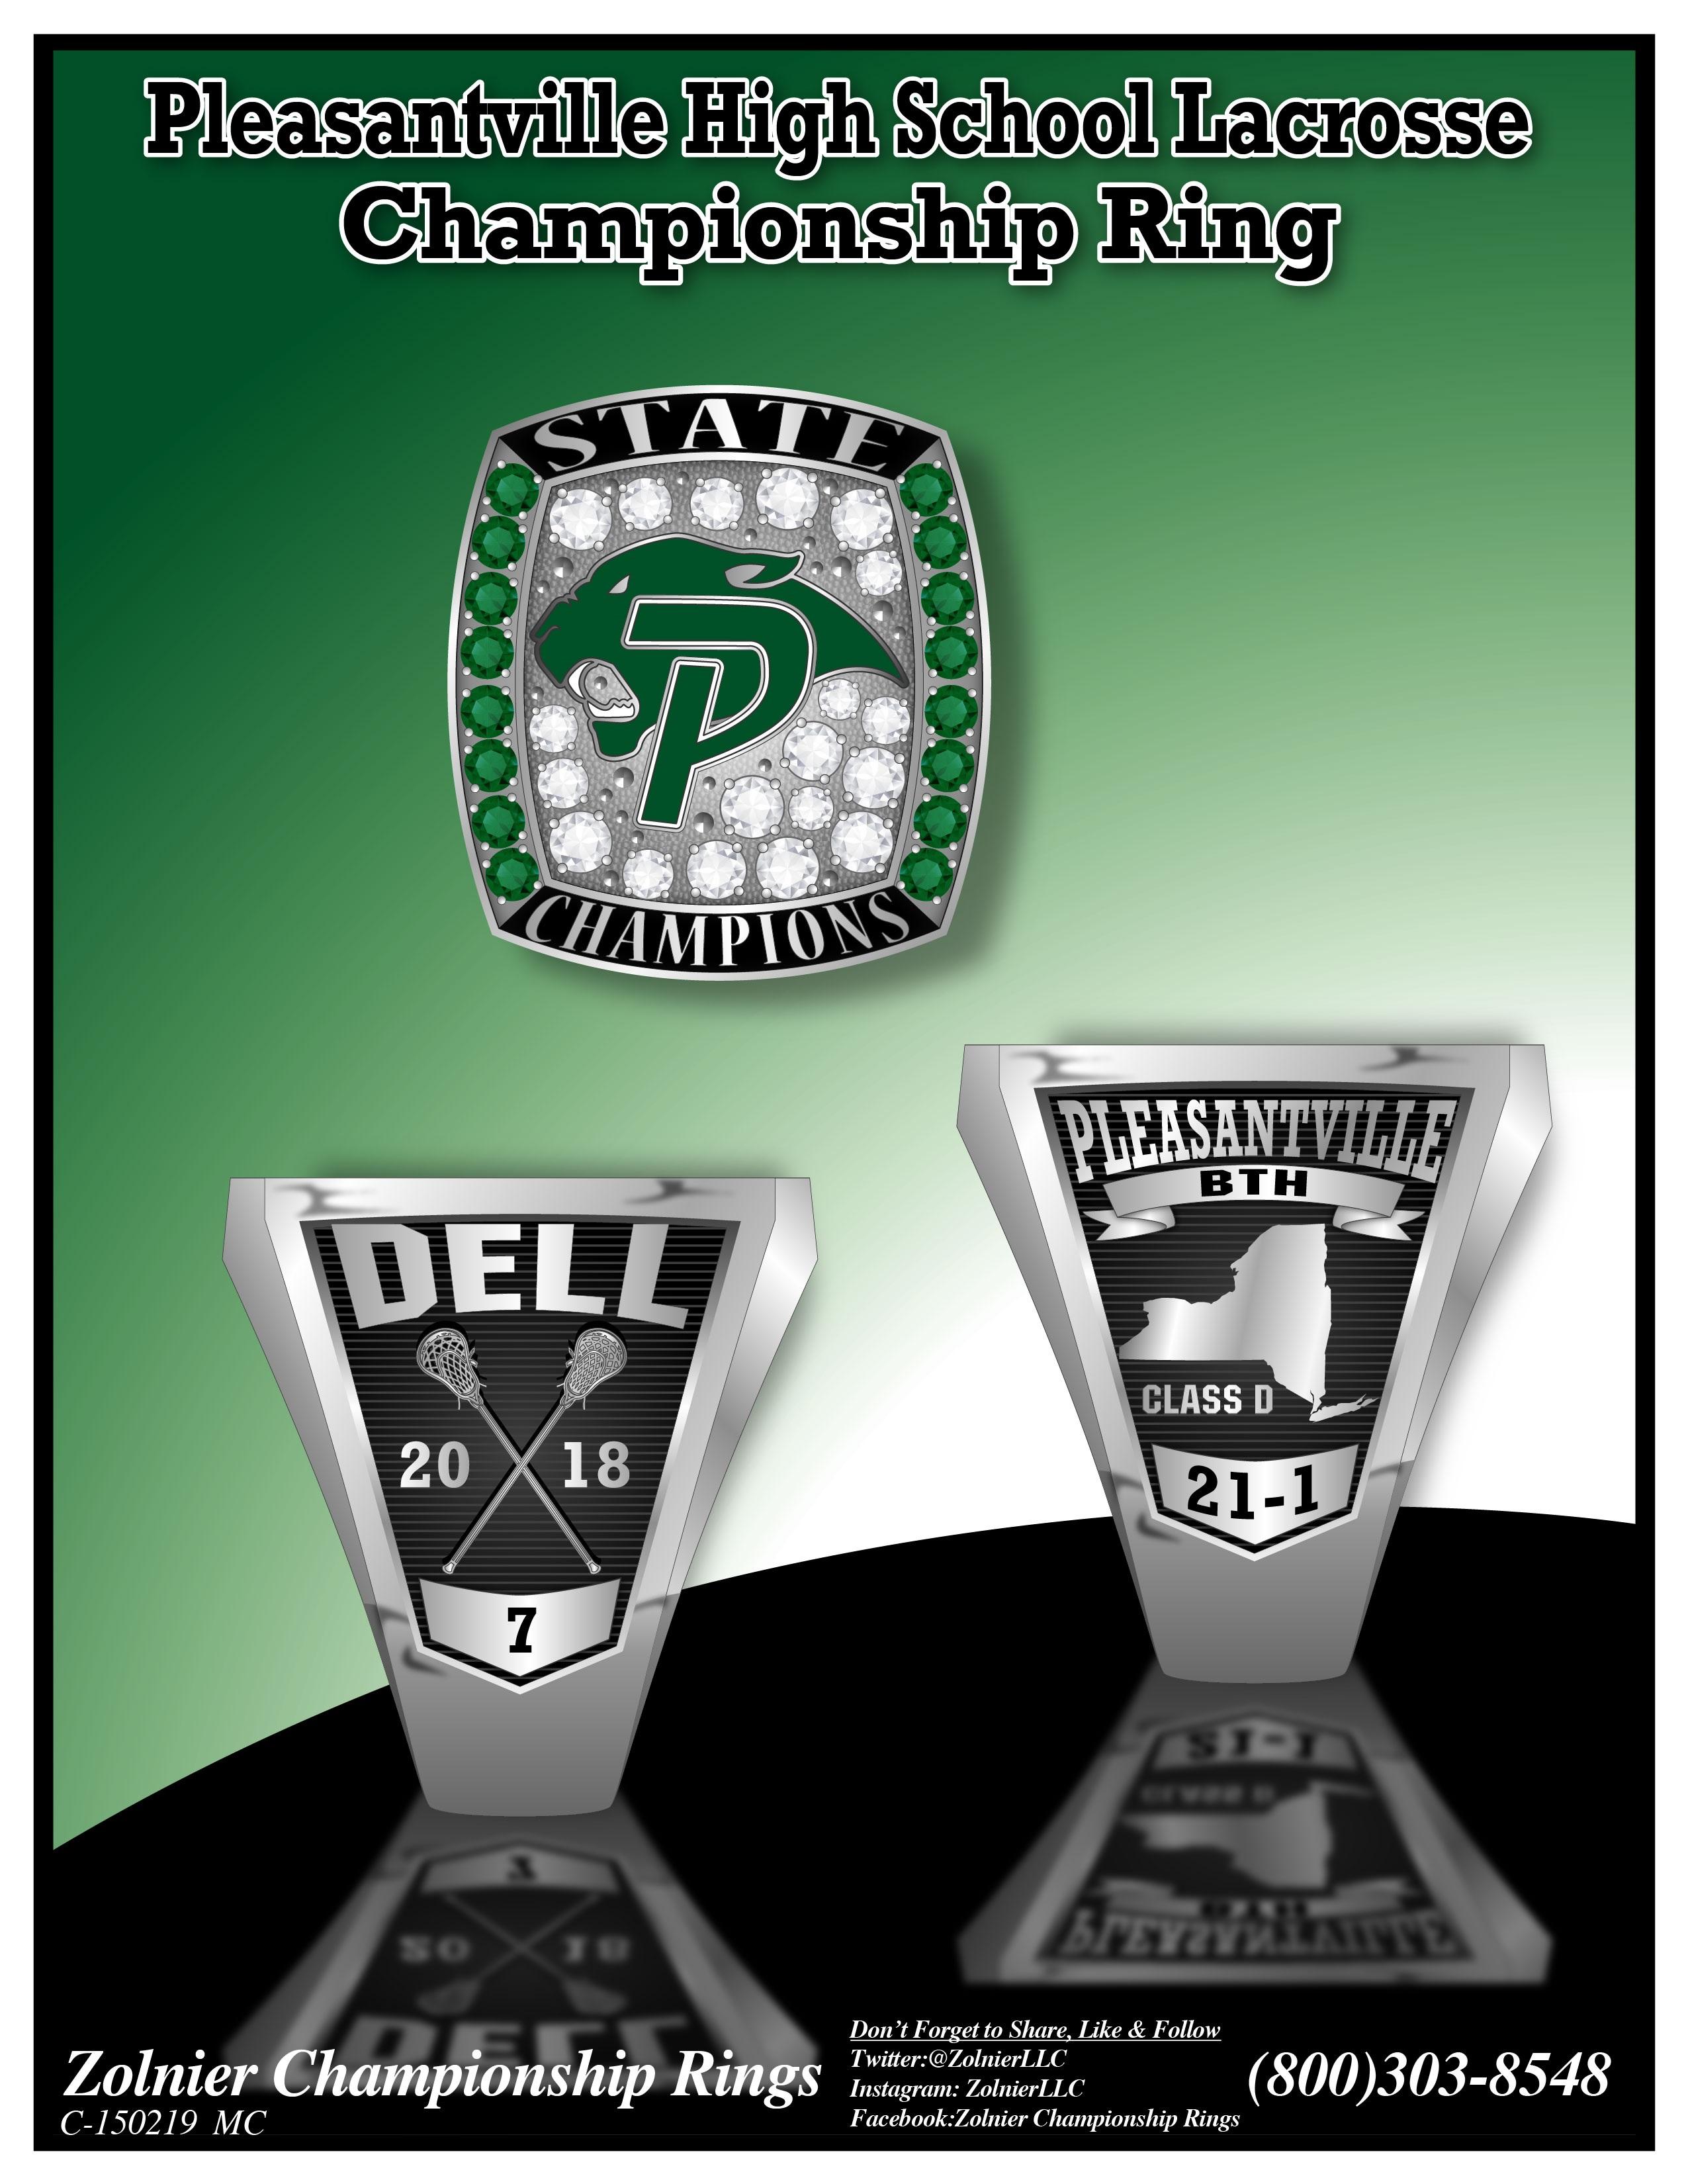 C-150219 Pleasantville HS Lacrosse Champ Ring